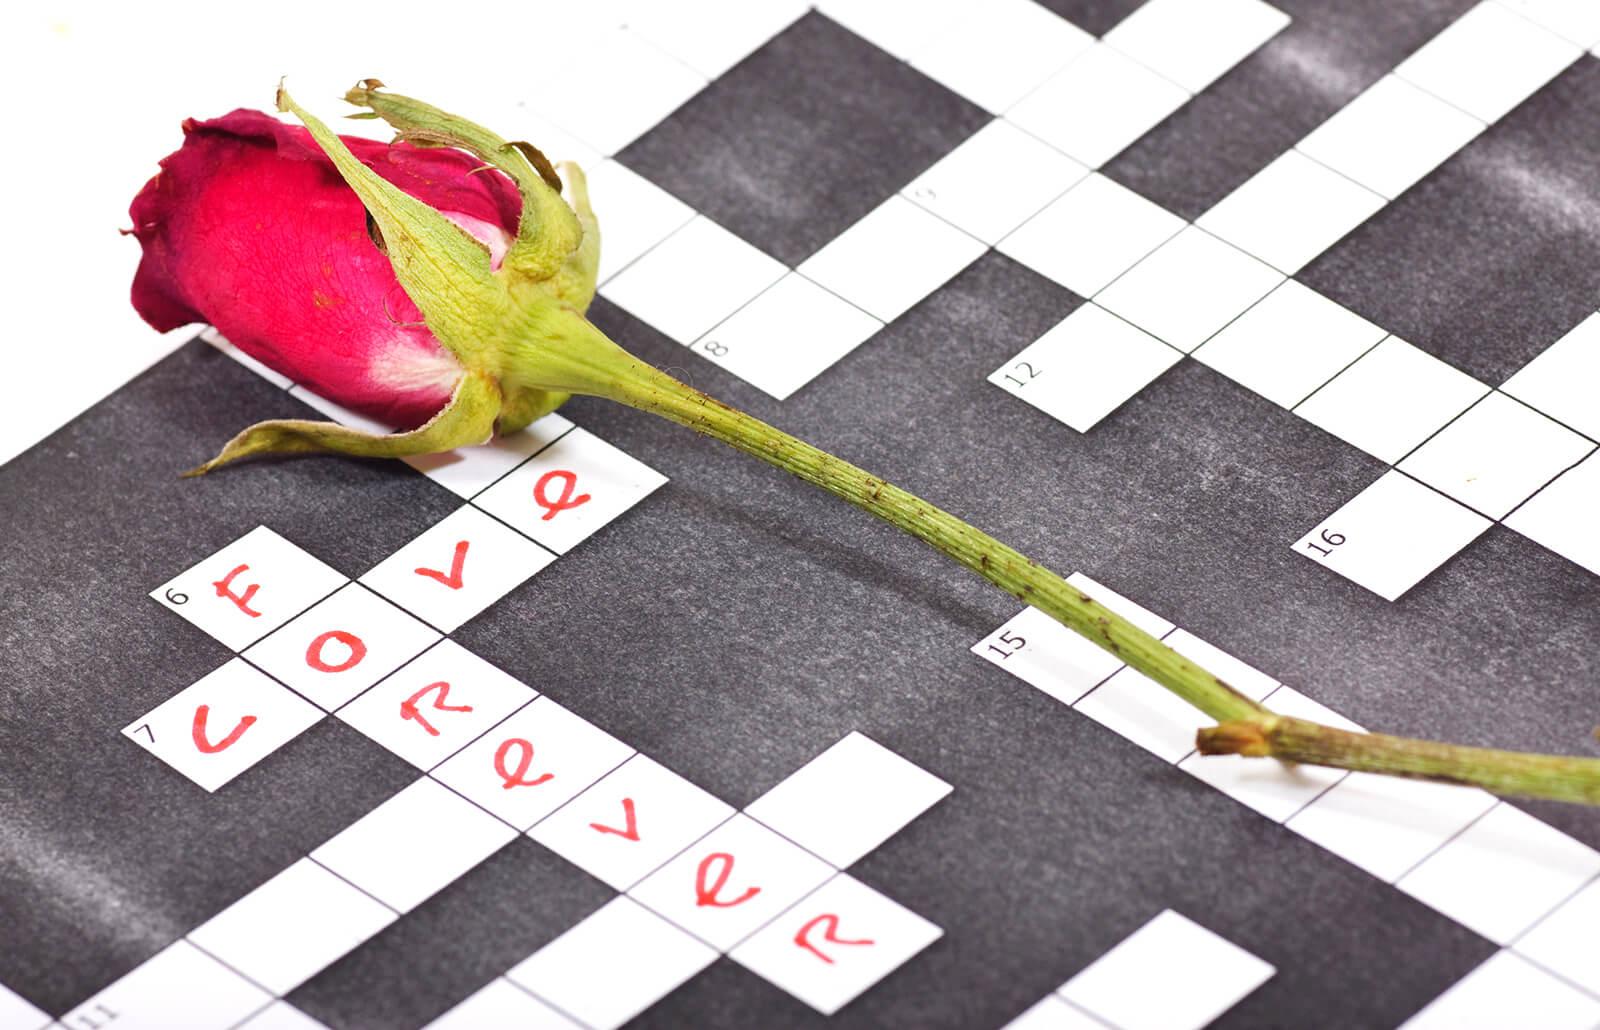 Free Printable Bridal Shower Games   Lovetoknow - Free Printable Bridal Shower Crossword Puzzle